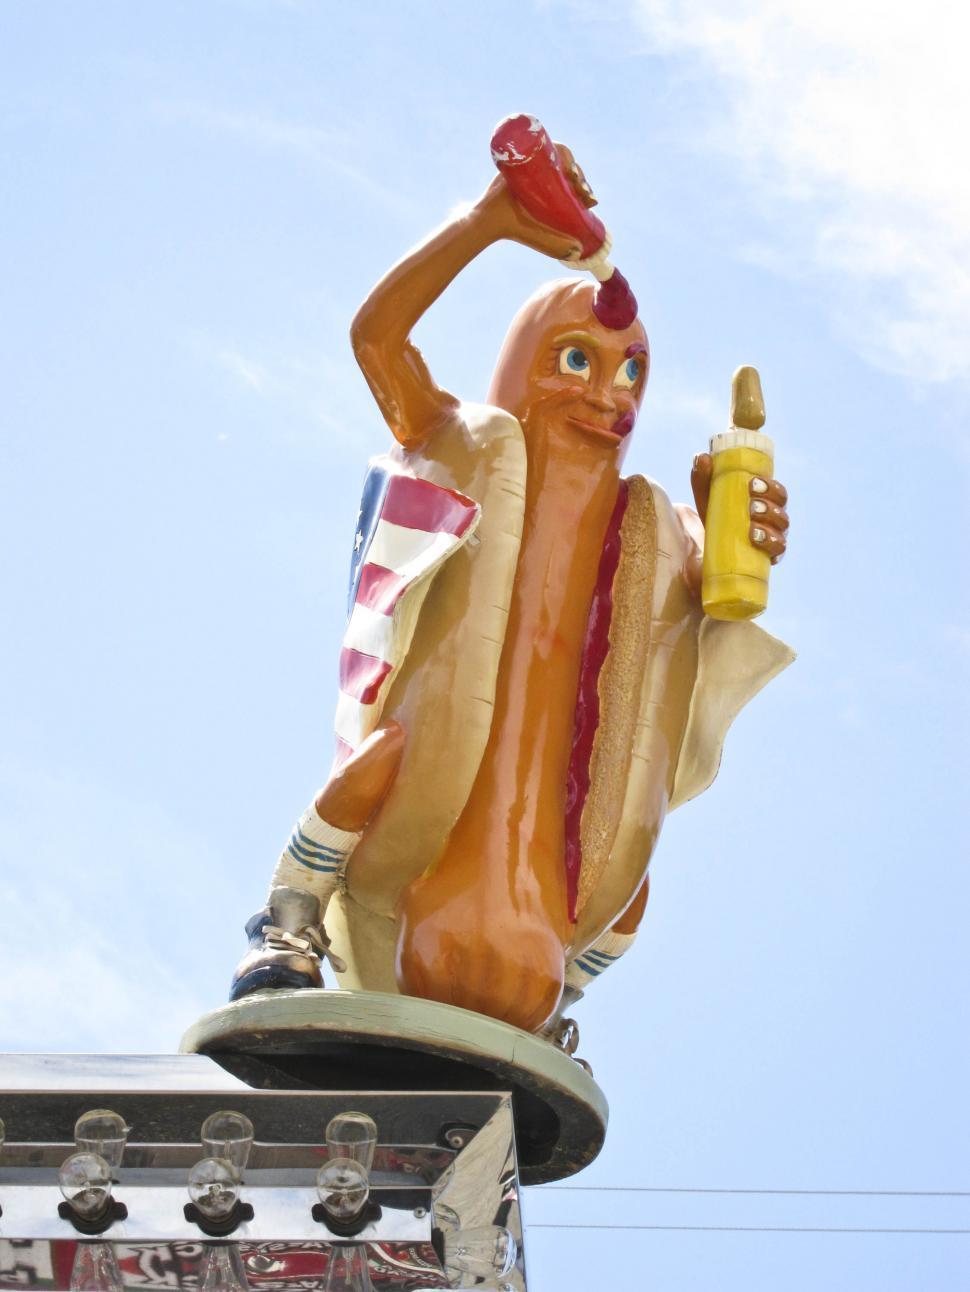 Download Free Stock Photo of Hotdog